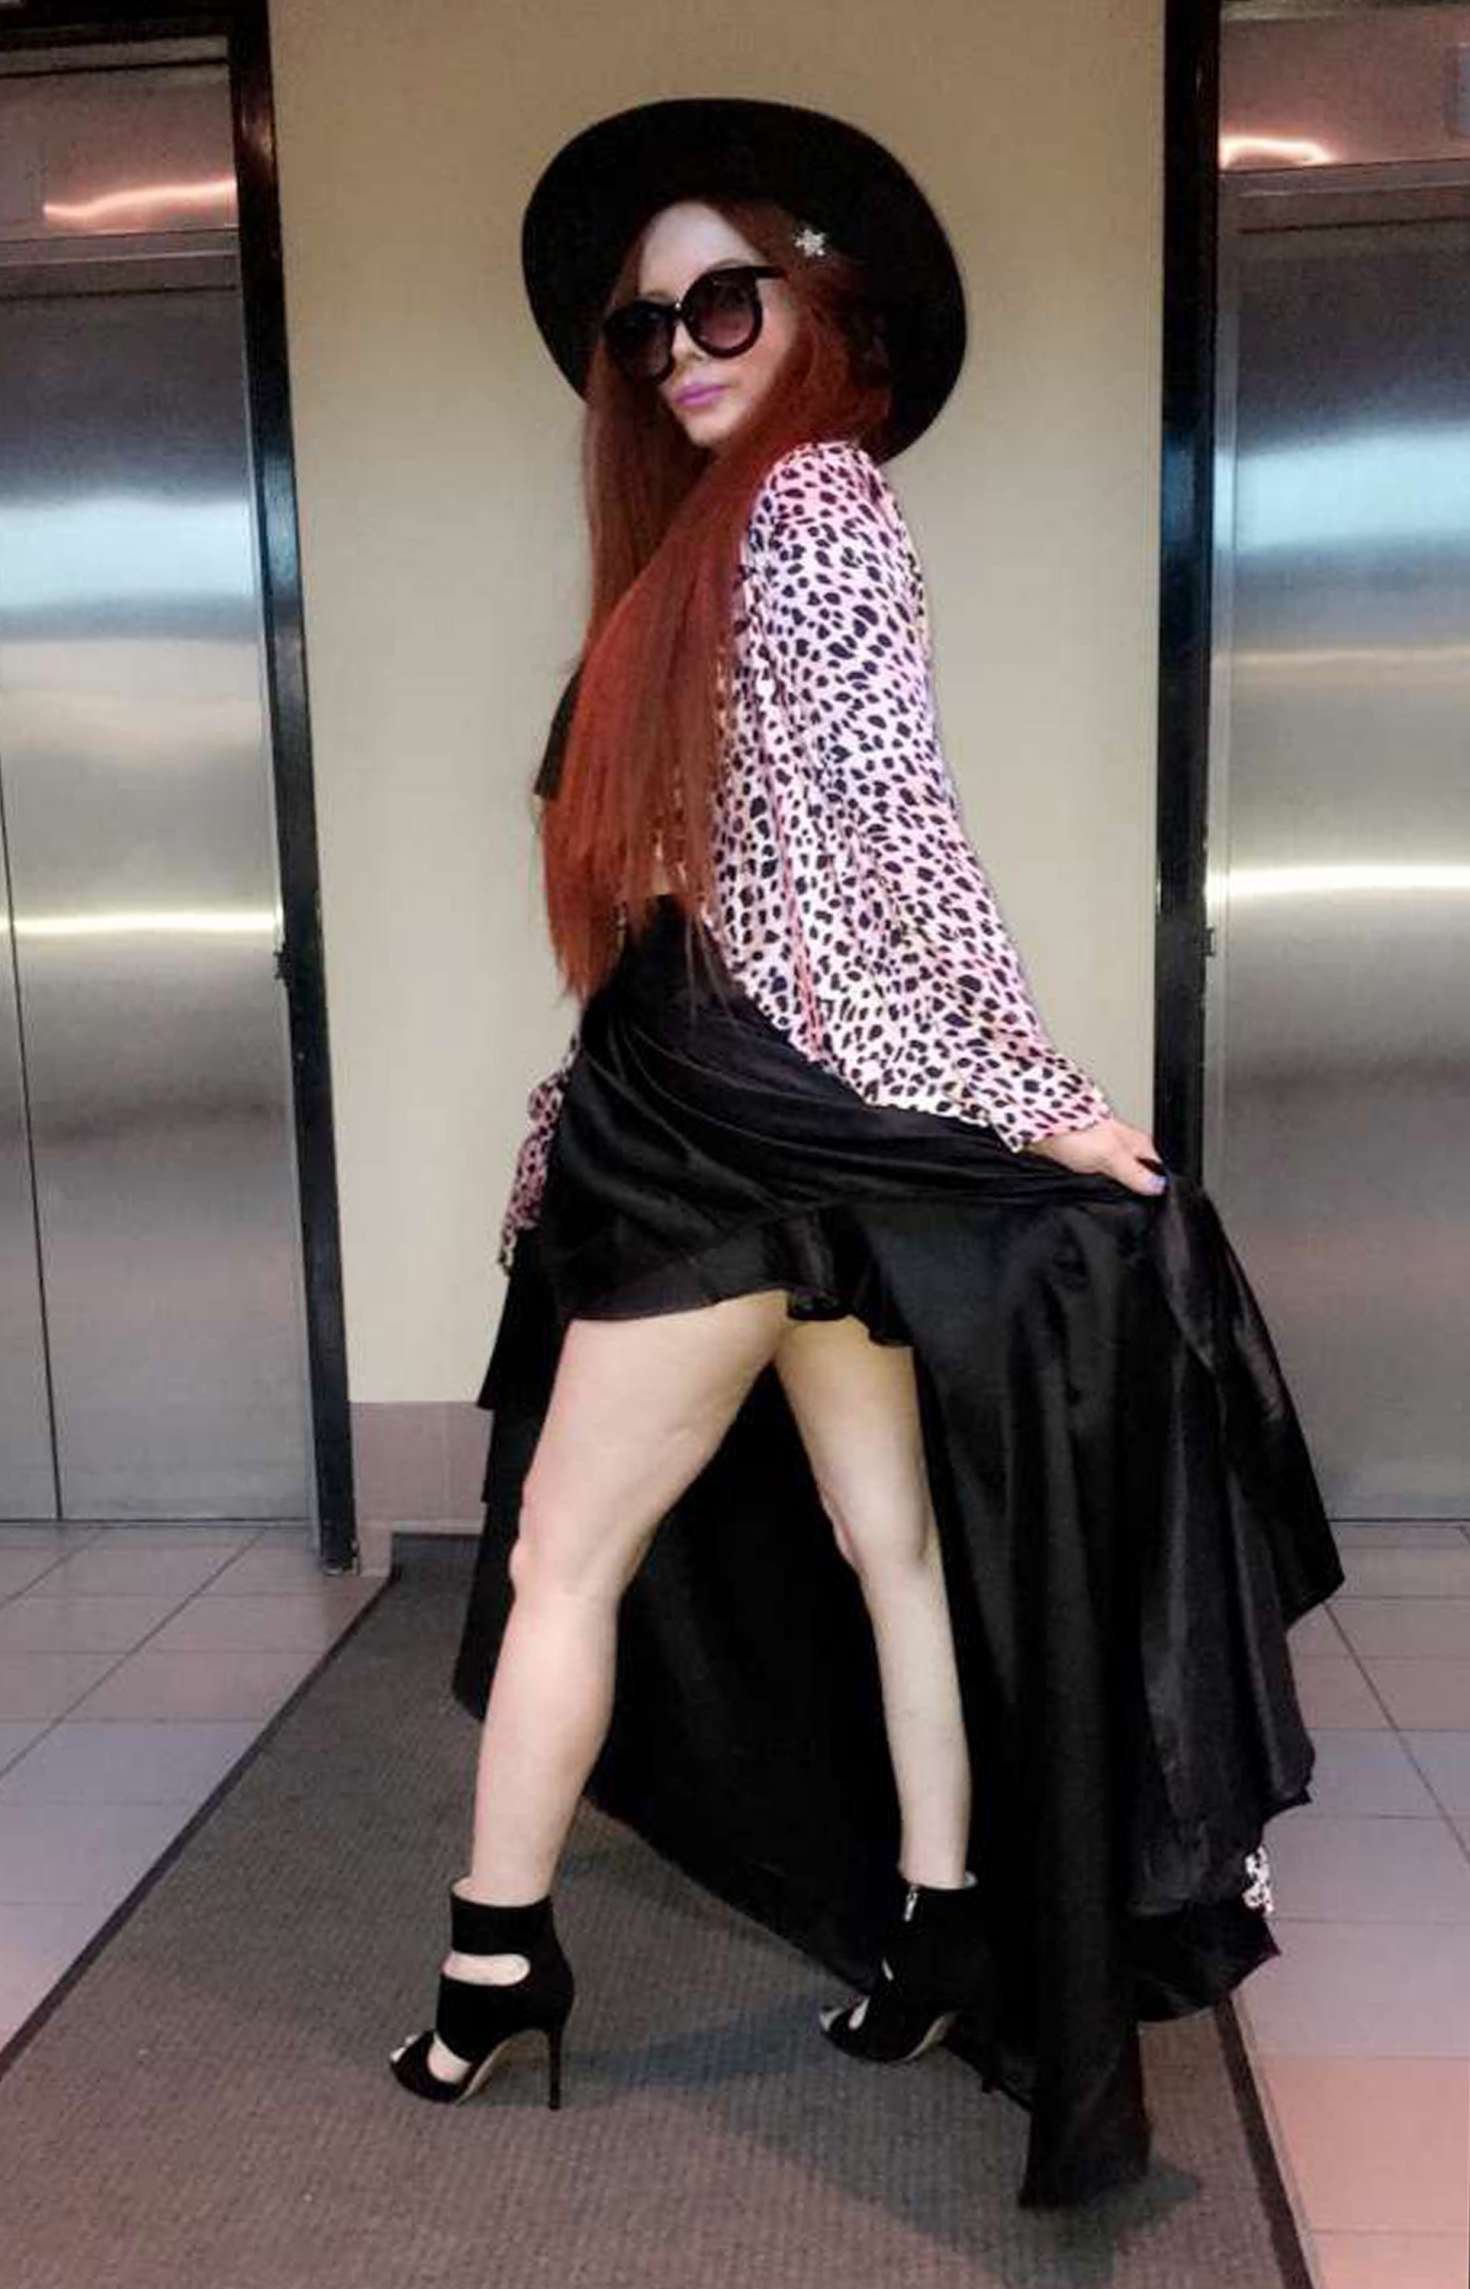 Pantyhose noemi s world feet